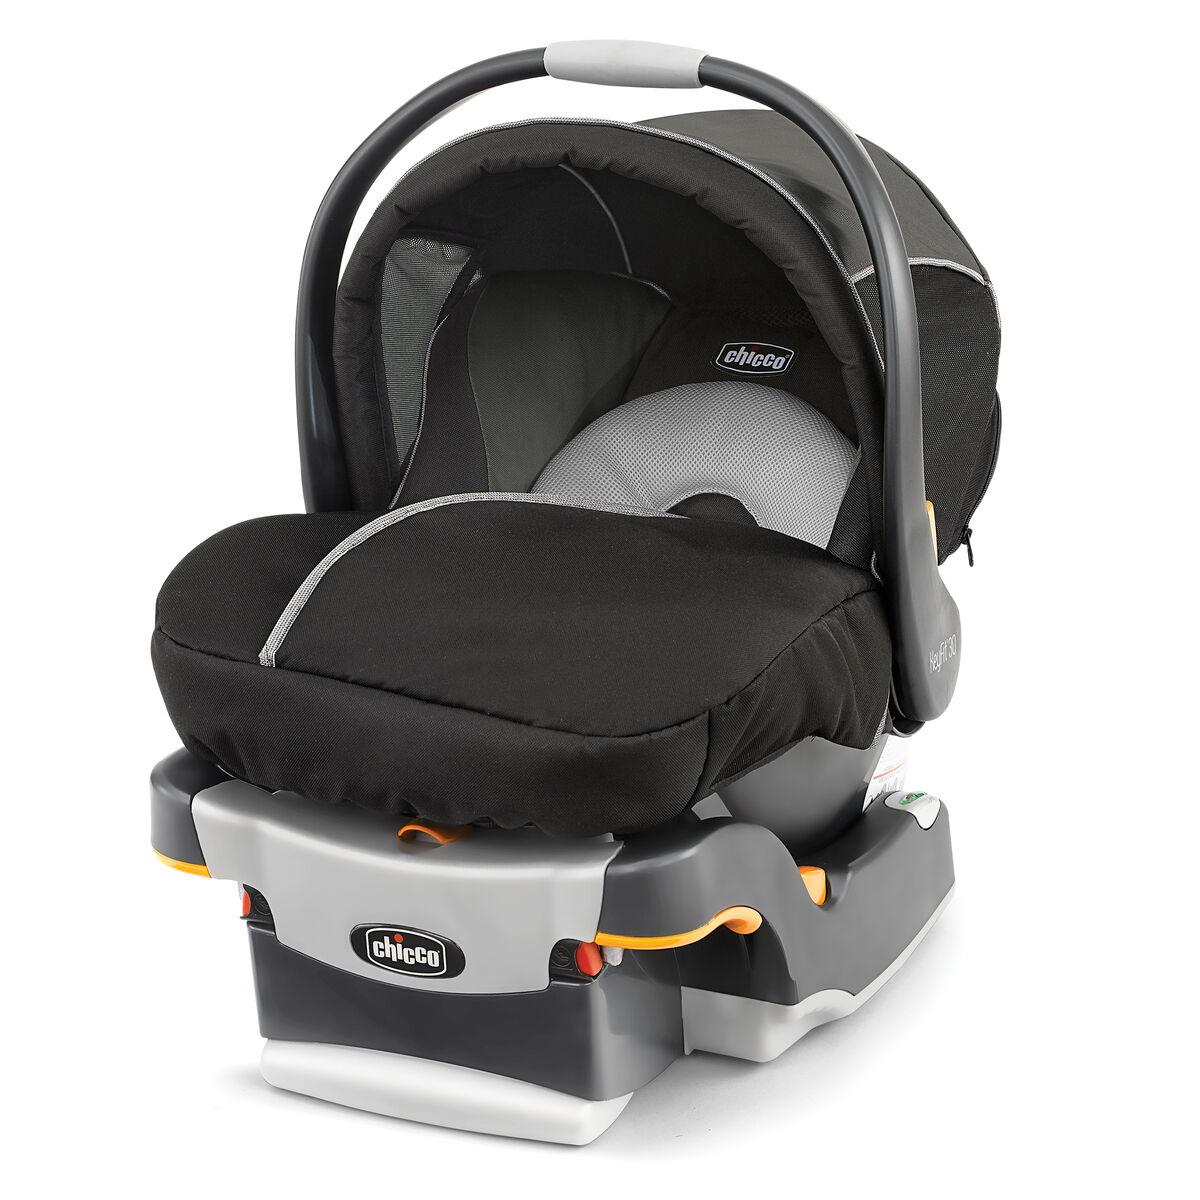 Chicco Chicco Keyfit Magic Infant Car Seat Coal